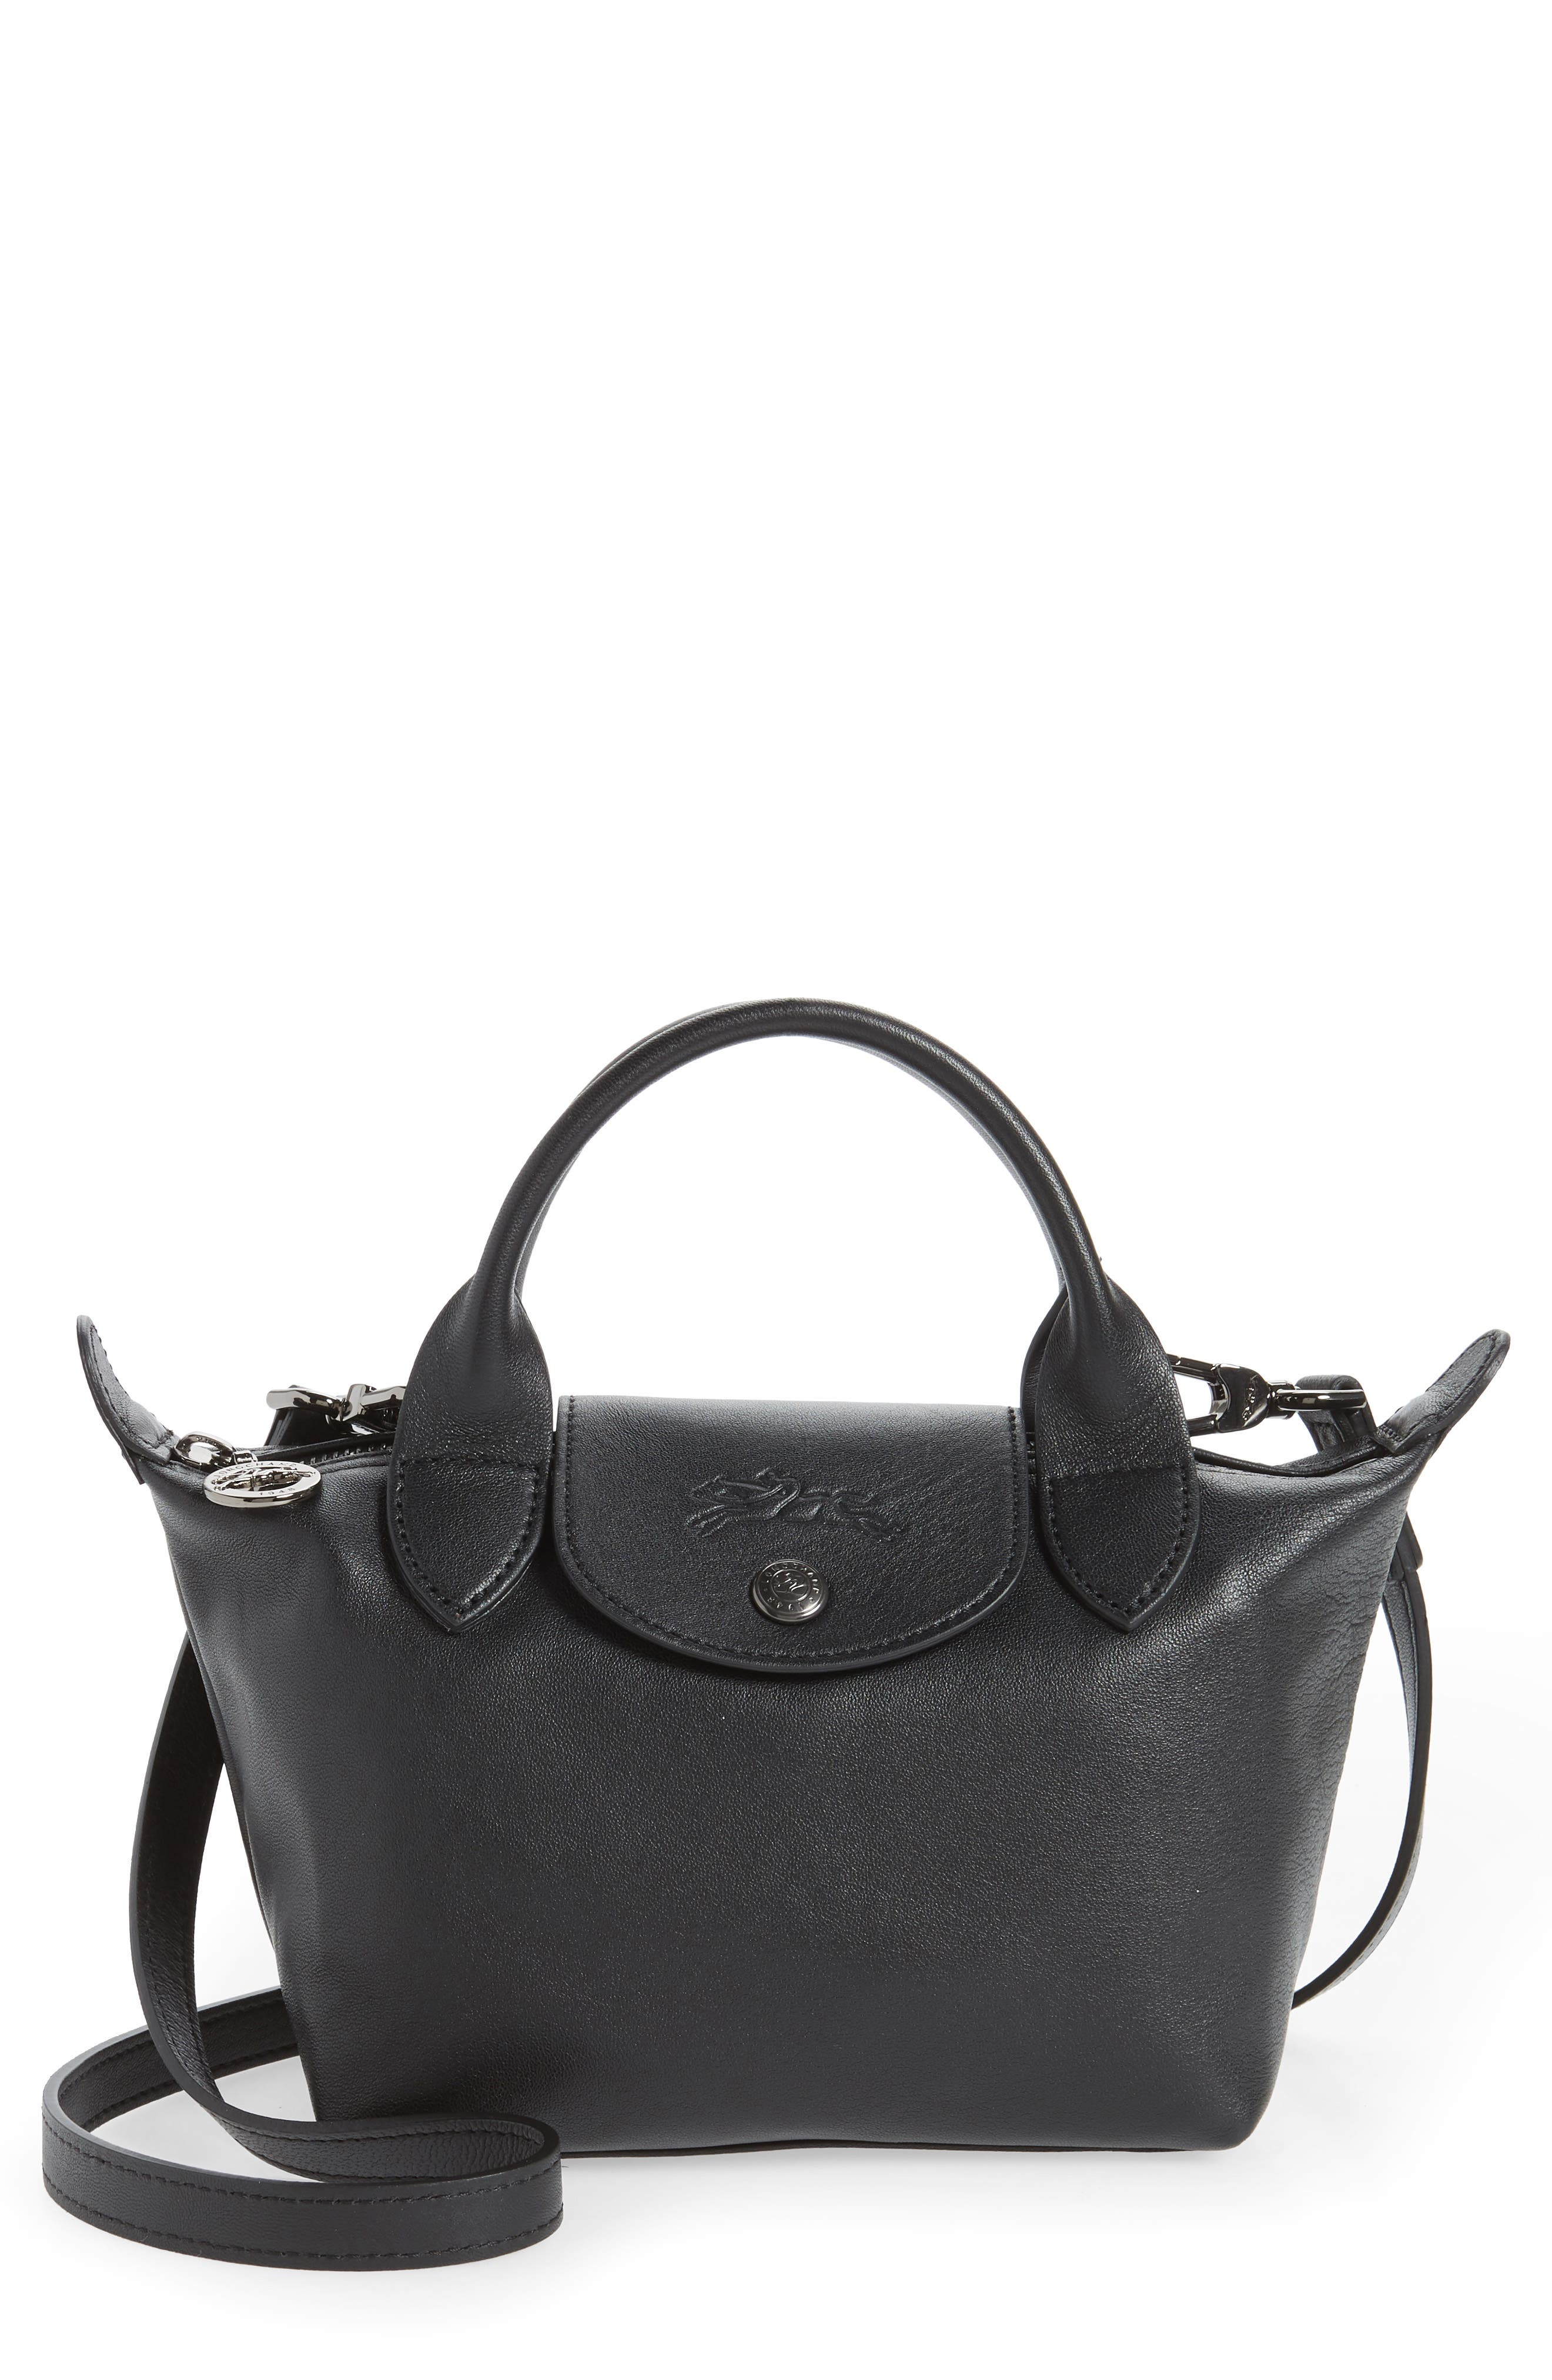 Le Pliage Cuir Leather Top Handle Bag